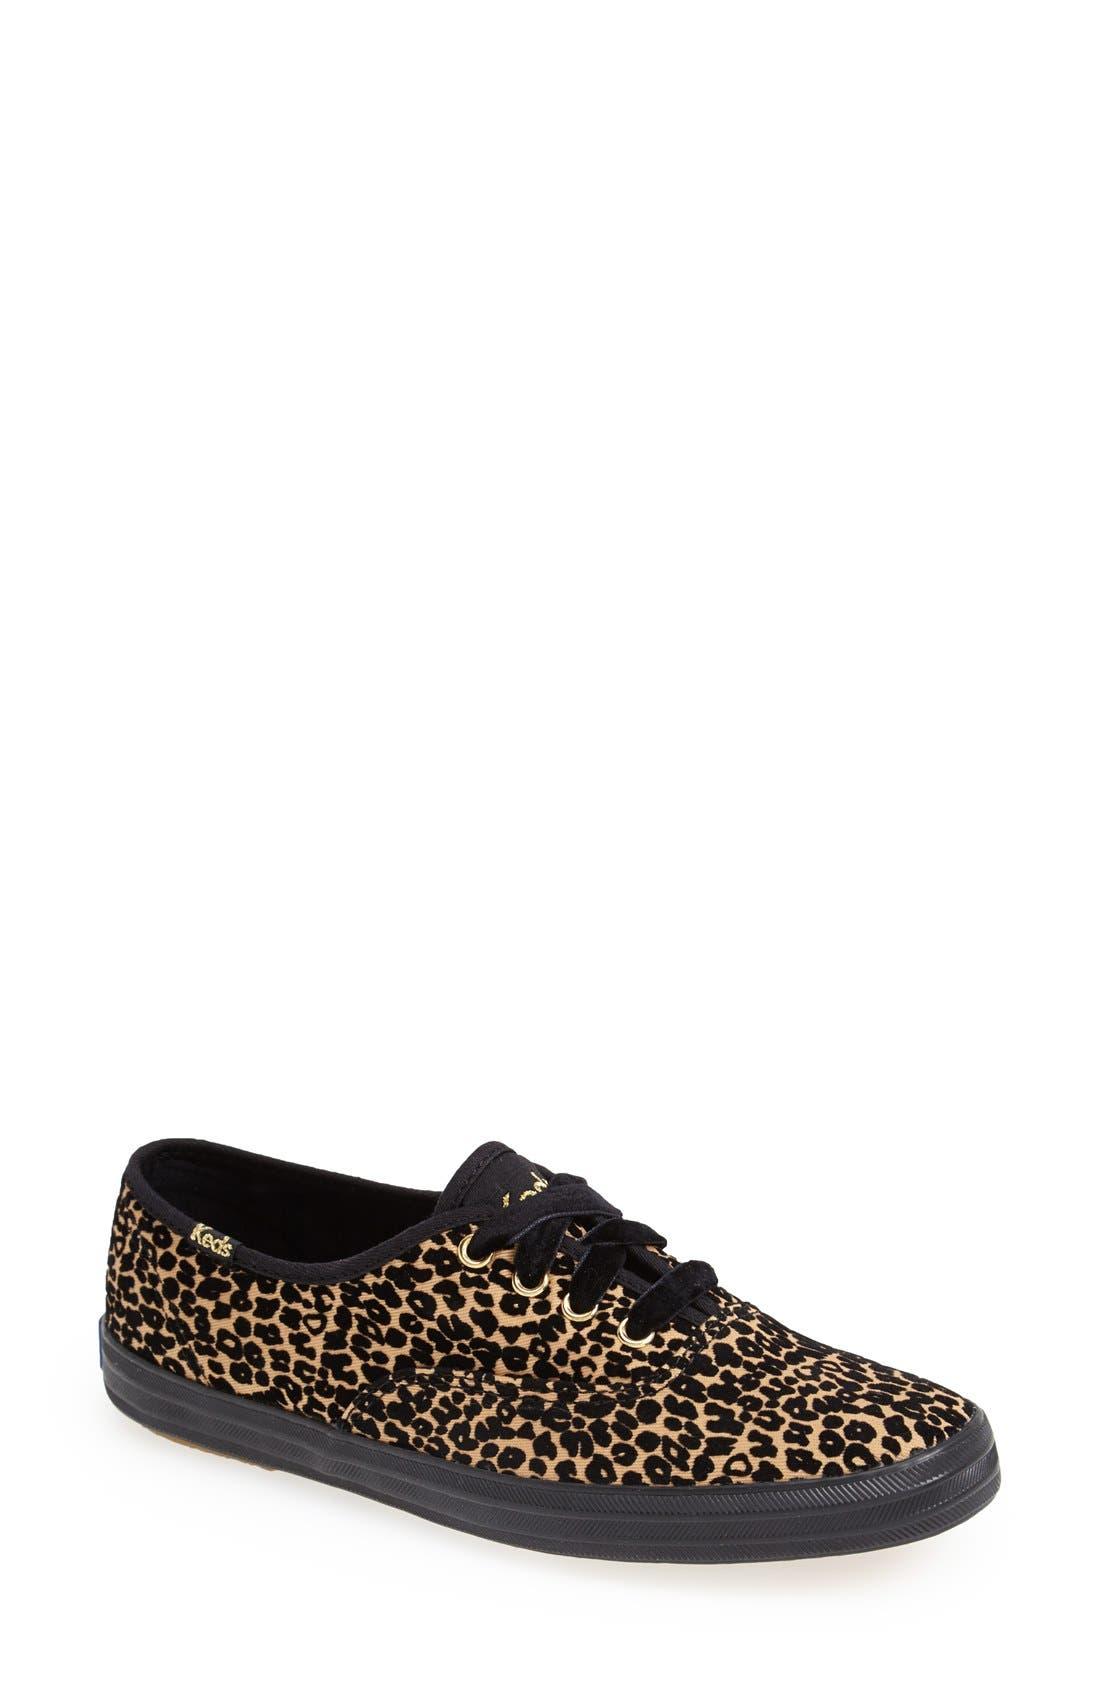 Alternate Image 1 Selected - Keds® 'Champion - Leopard Spot' Sneaker (Women)